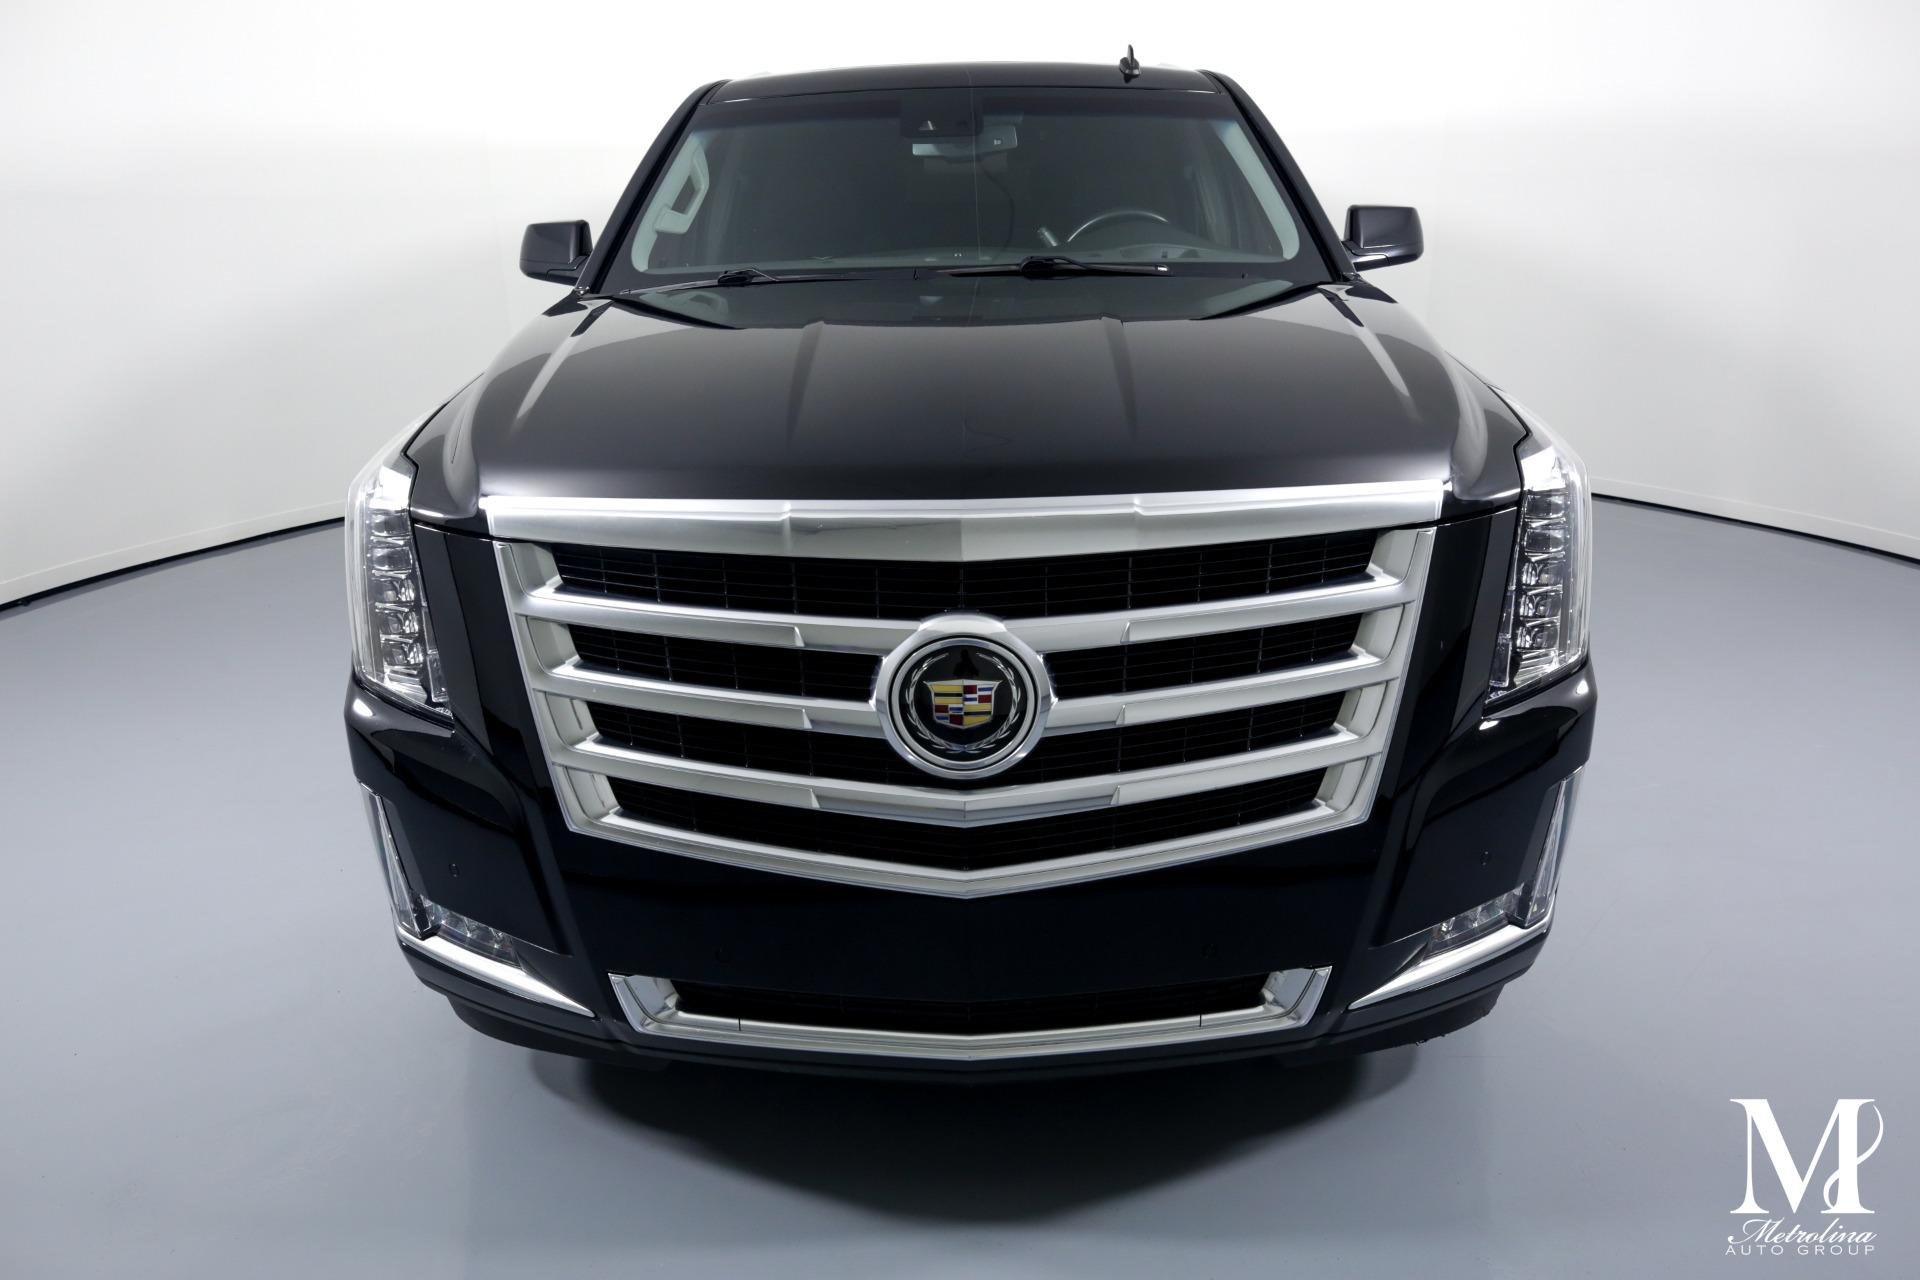 Used 2015 Cadillac Escalade ESV Premium for sale $59,996 at Metrolina Auto Group in Charlotte NC 28217 - 3